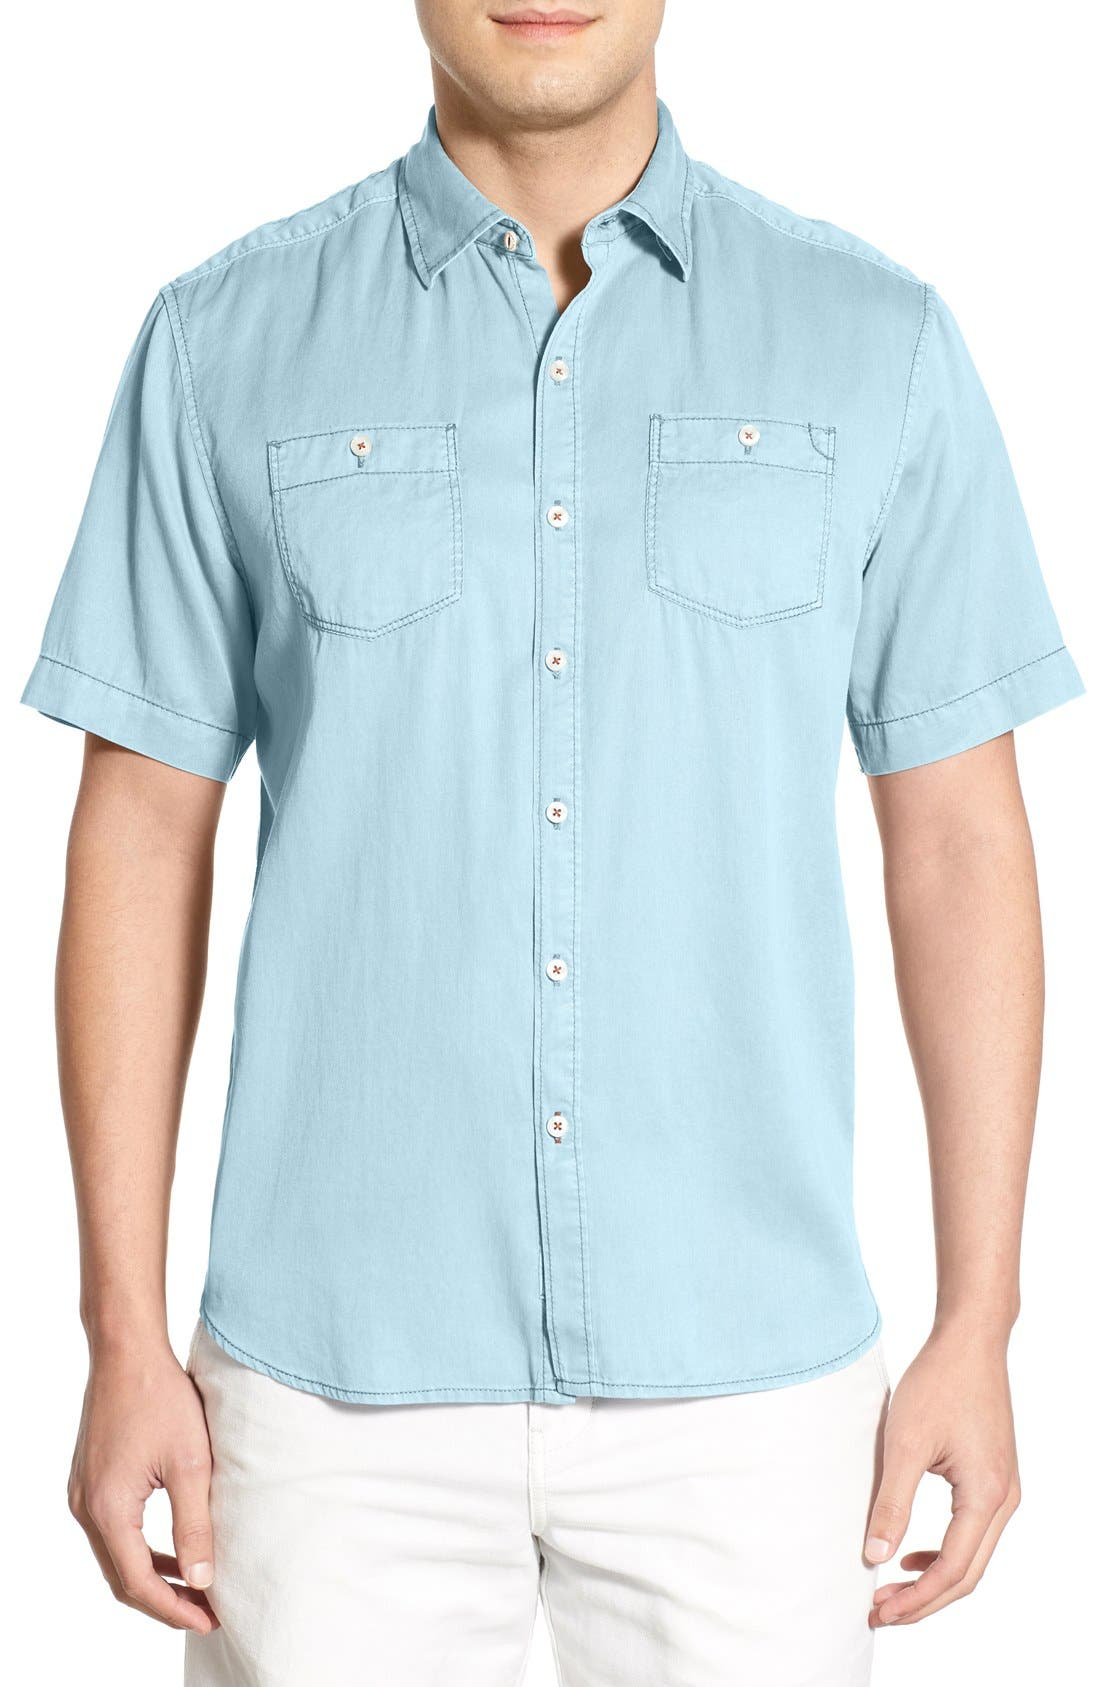 TOMMY BAHAMA New Twilly Island Modern Fit Short Sleeve Twill Shirt